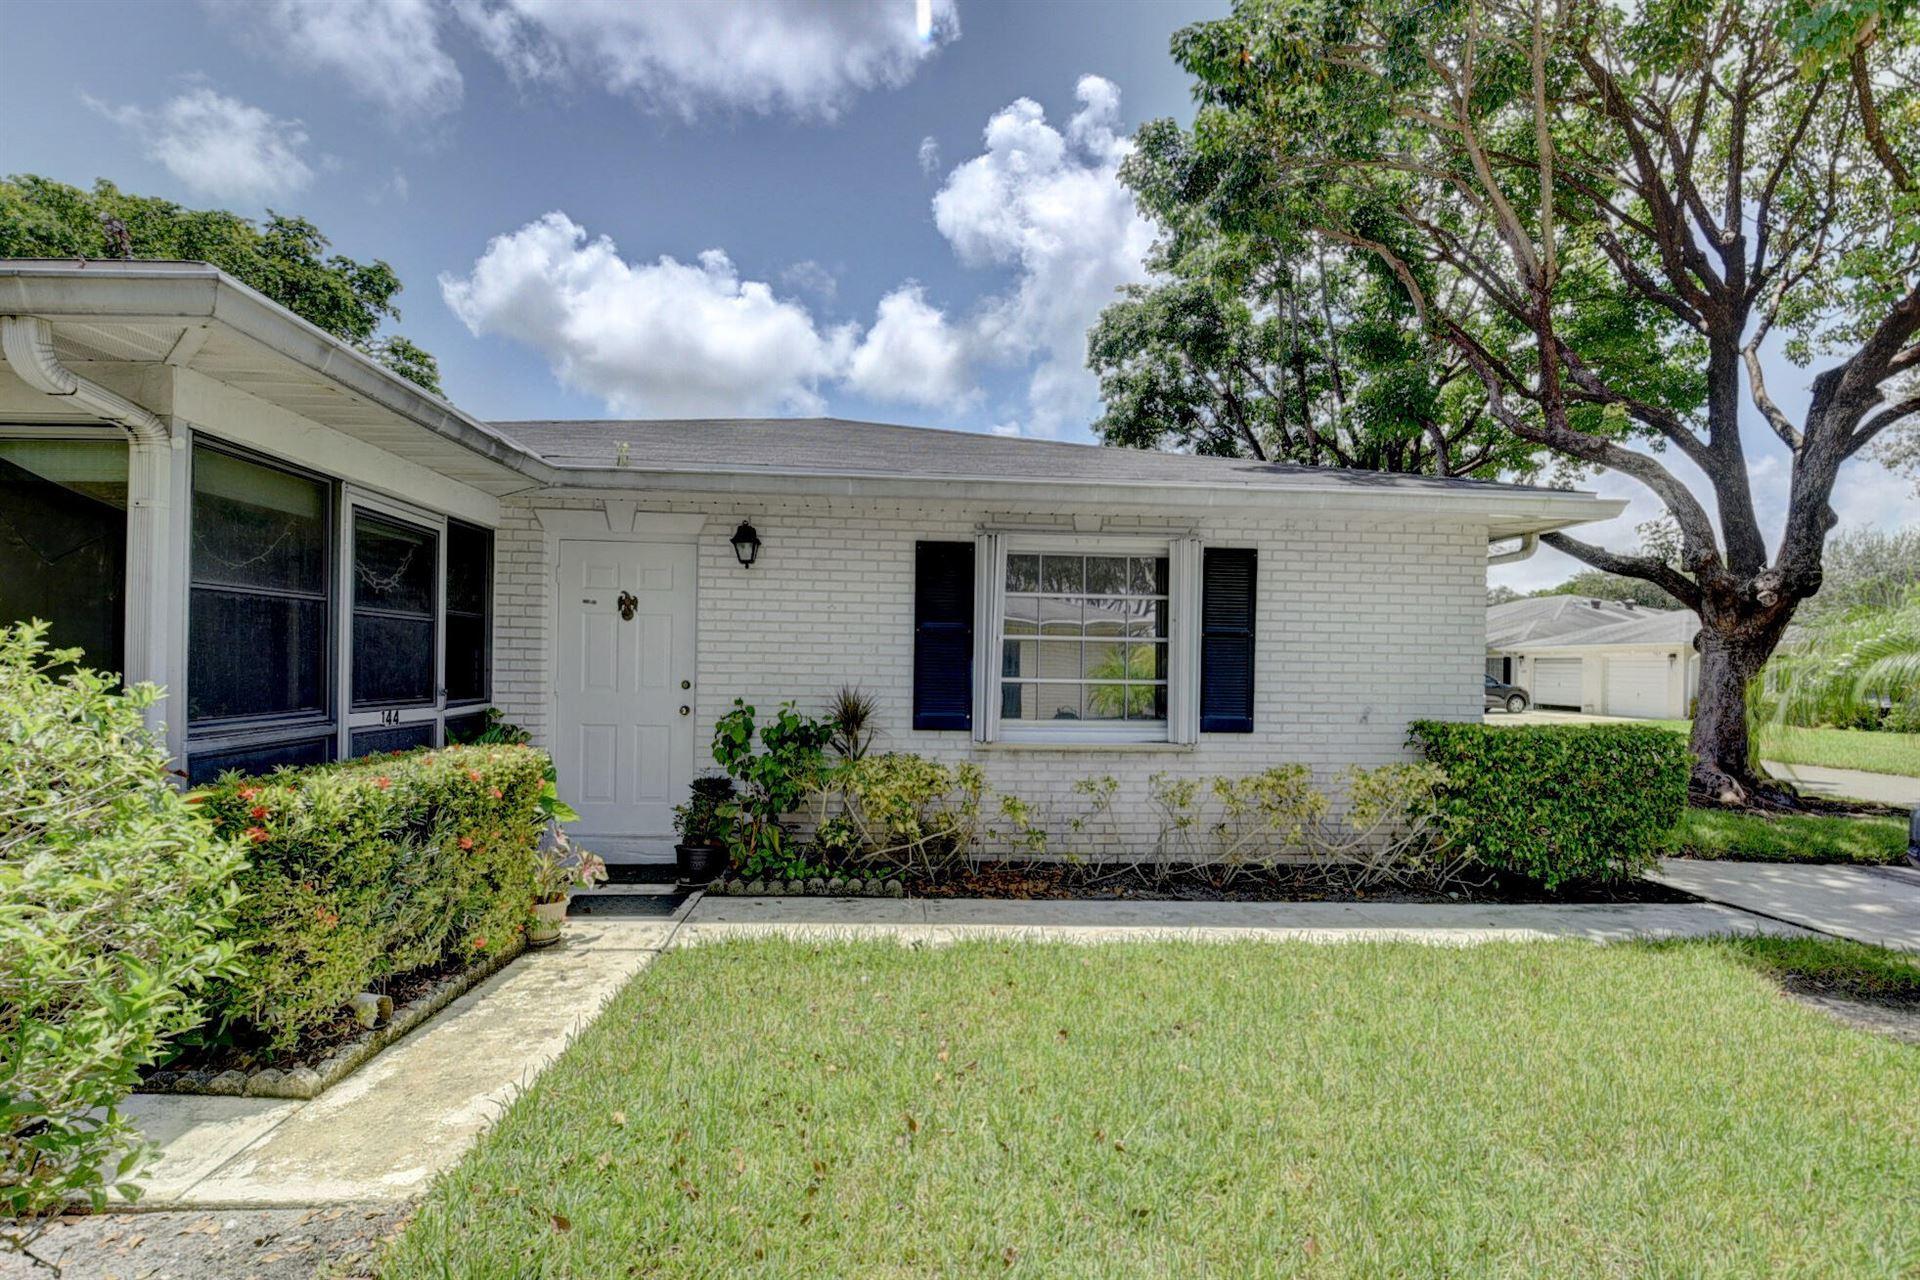 10096 42nd Terrace S #144, Boynton Beach, FL 33436 - MLS#: RX-10727435